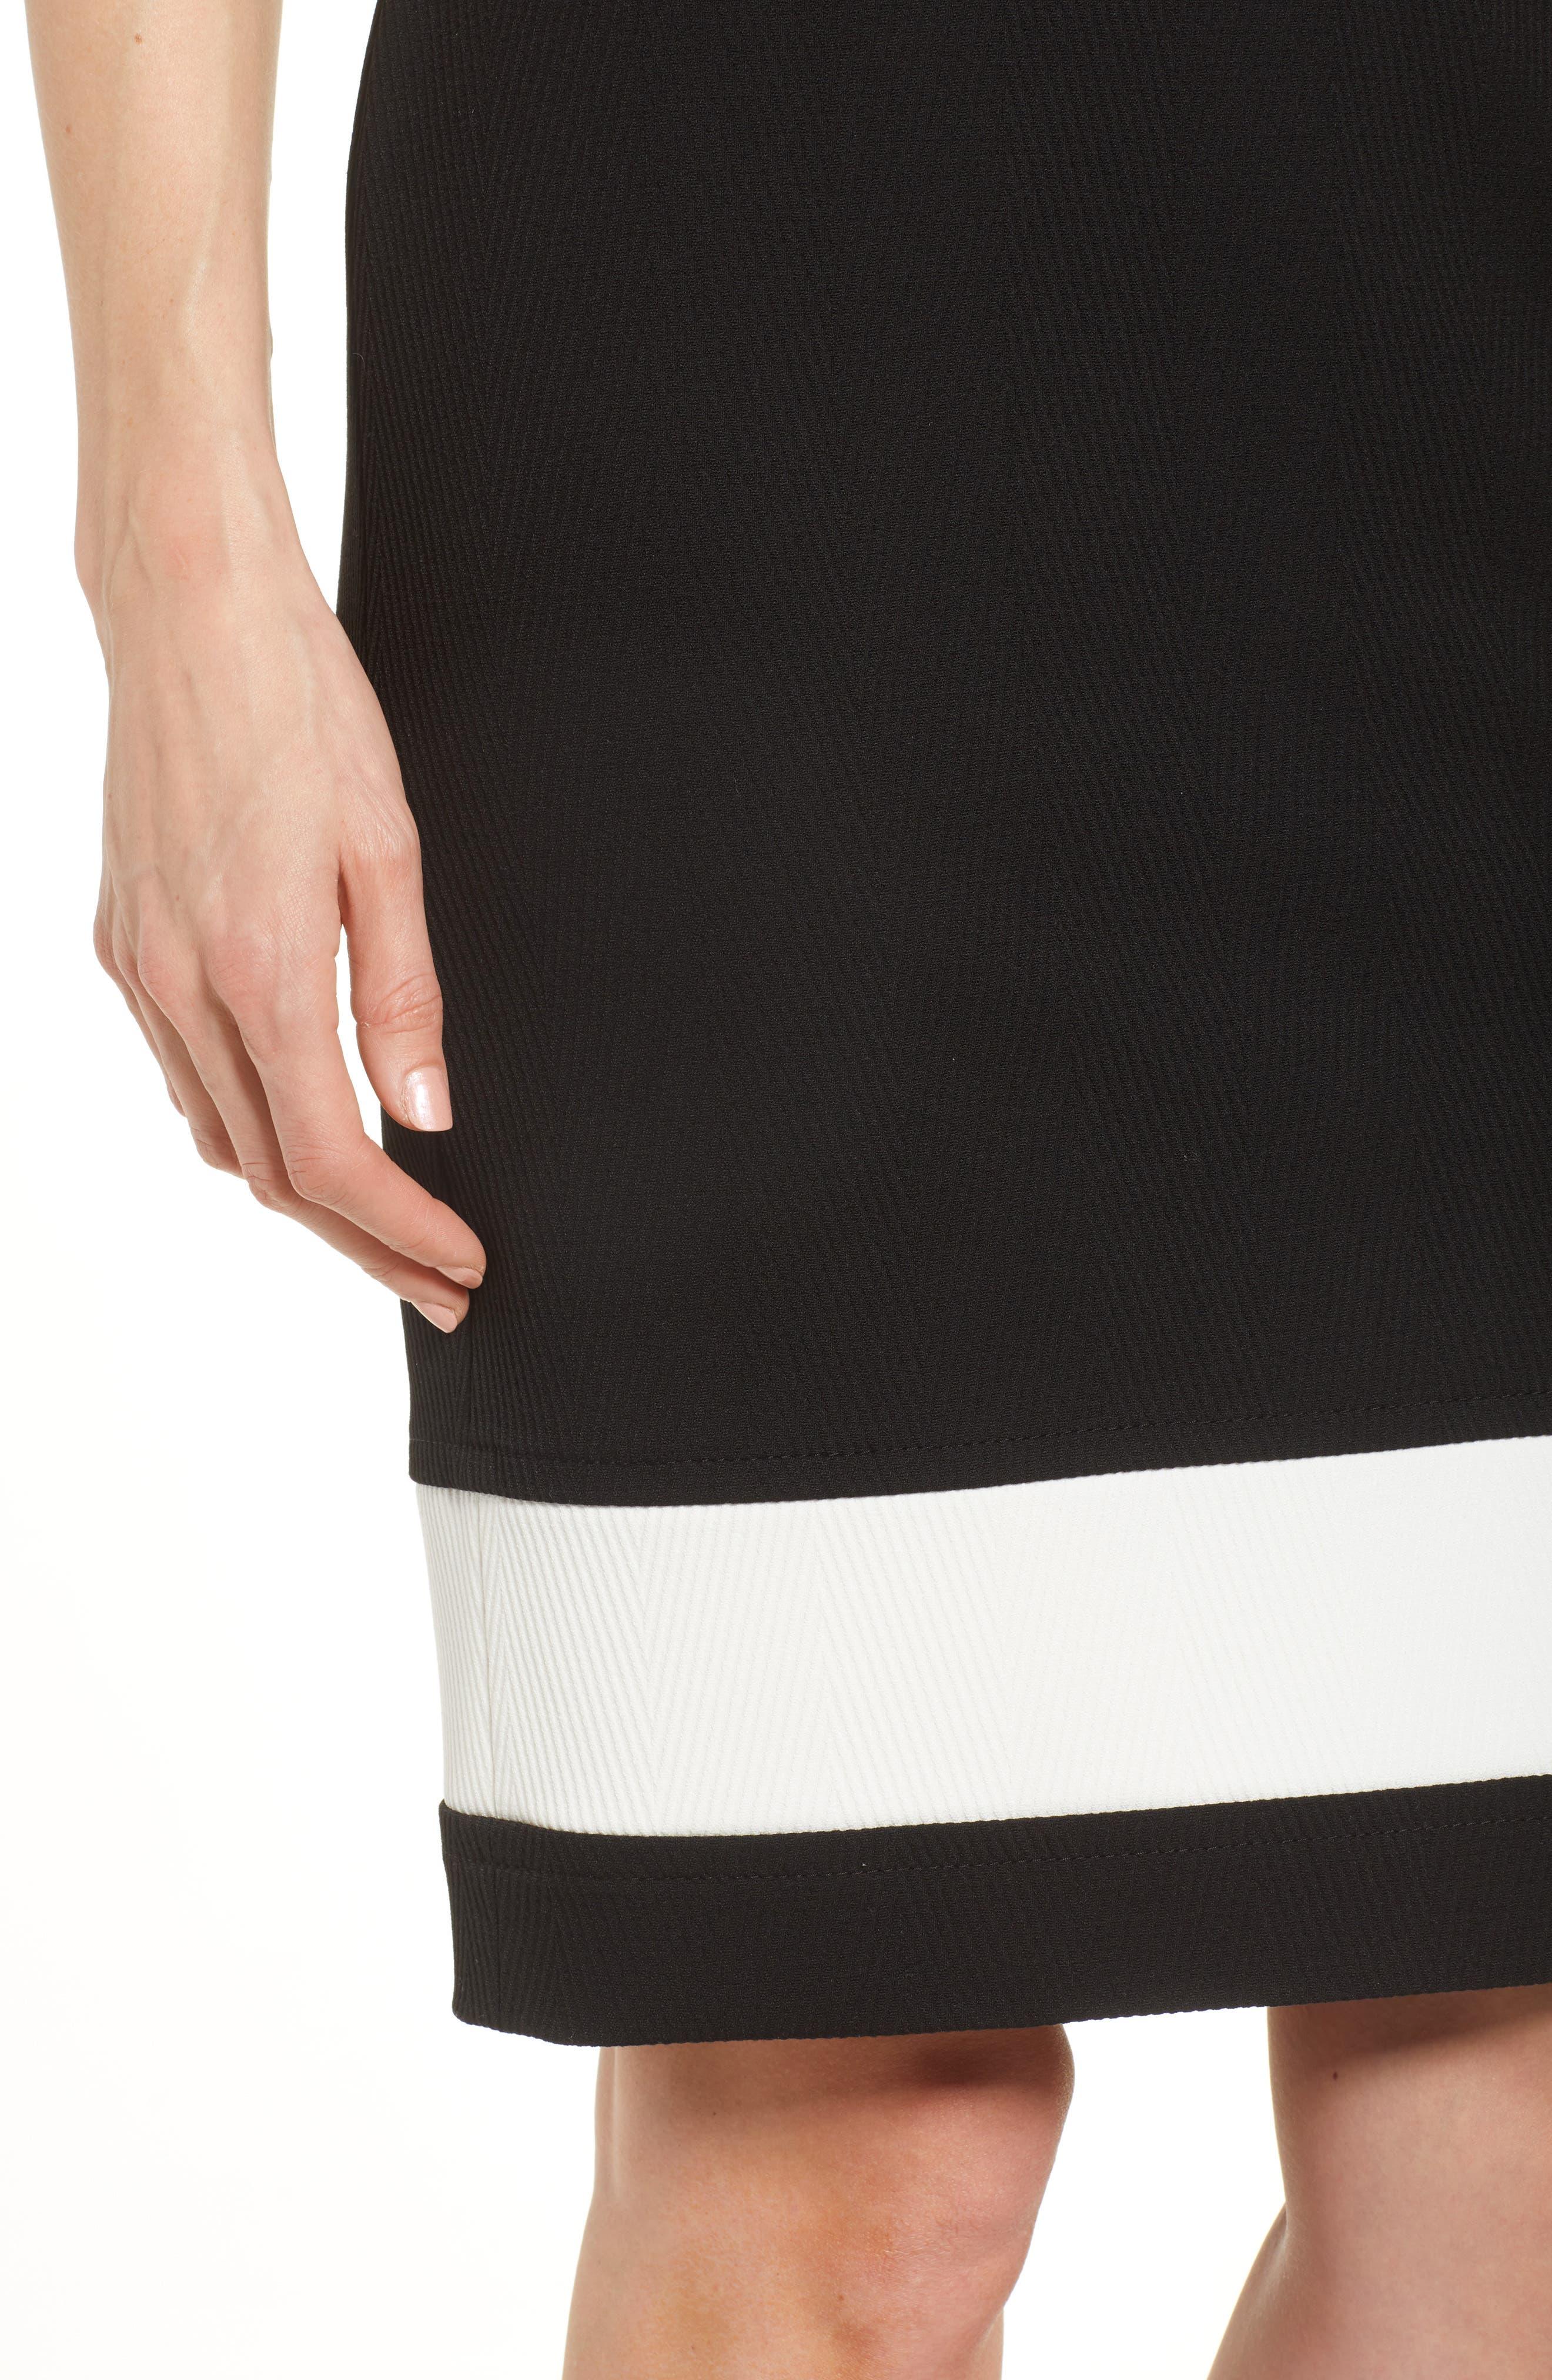 Dasmia Sheath Dress,                             Alternate thumbnail 4, color,                             Black